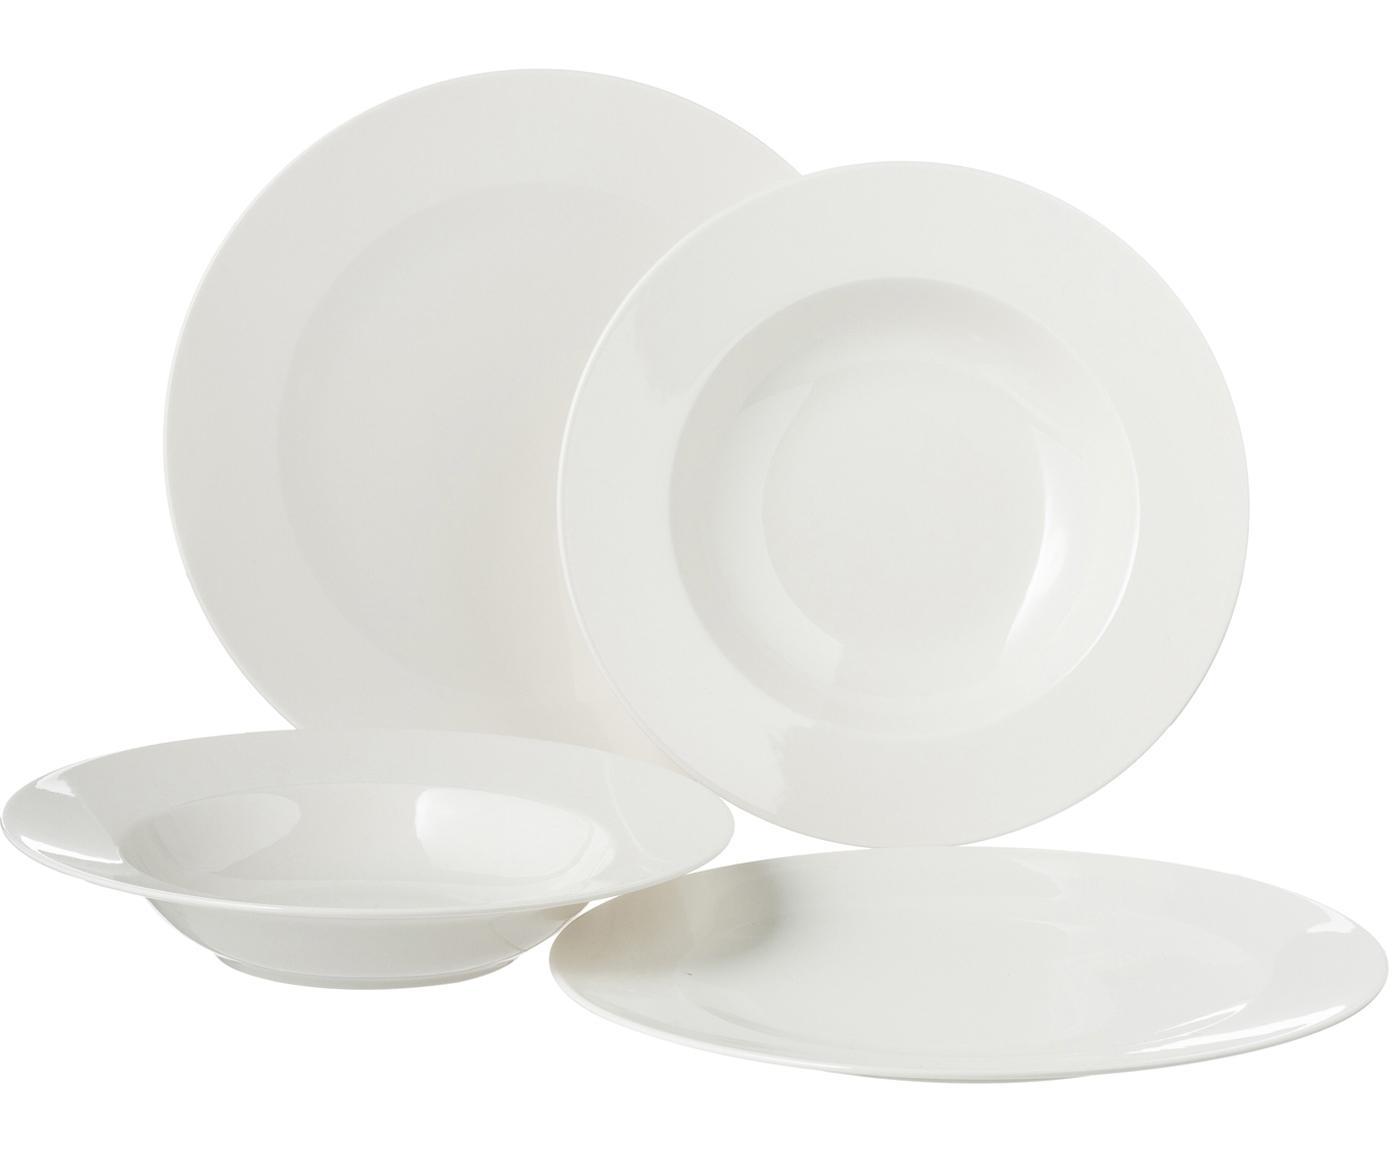 Vajila de porcelan For Me, 6comensales (8 pzas.), Porcelana, Blanco, Tamaños diferentes